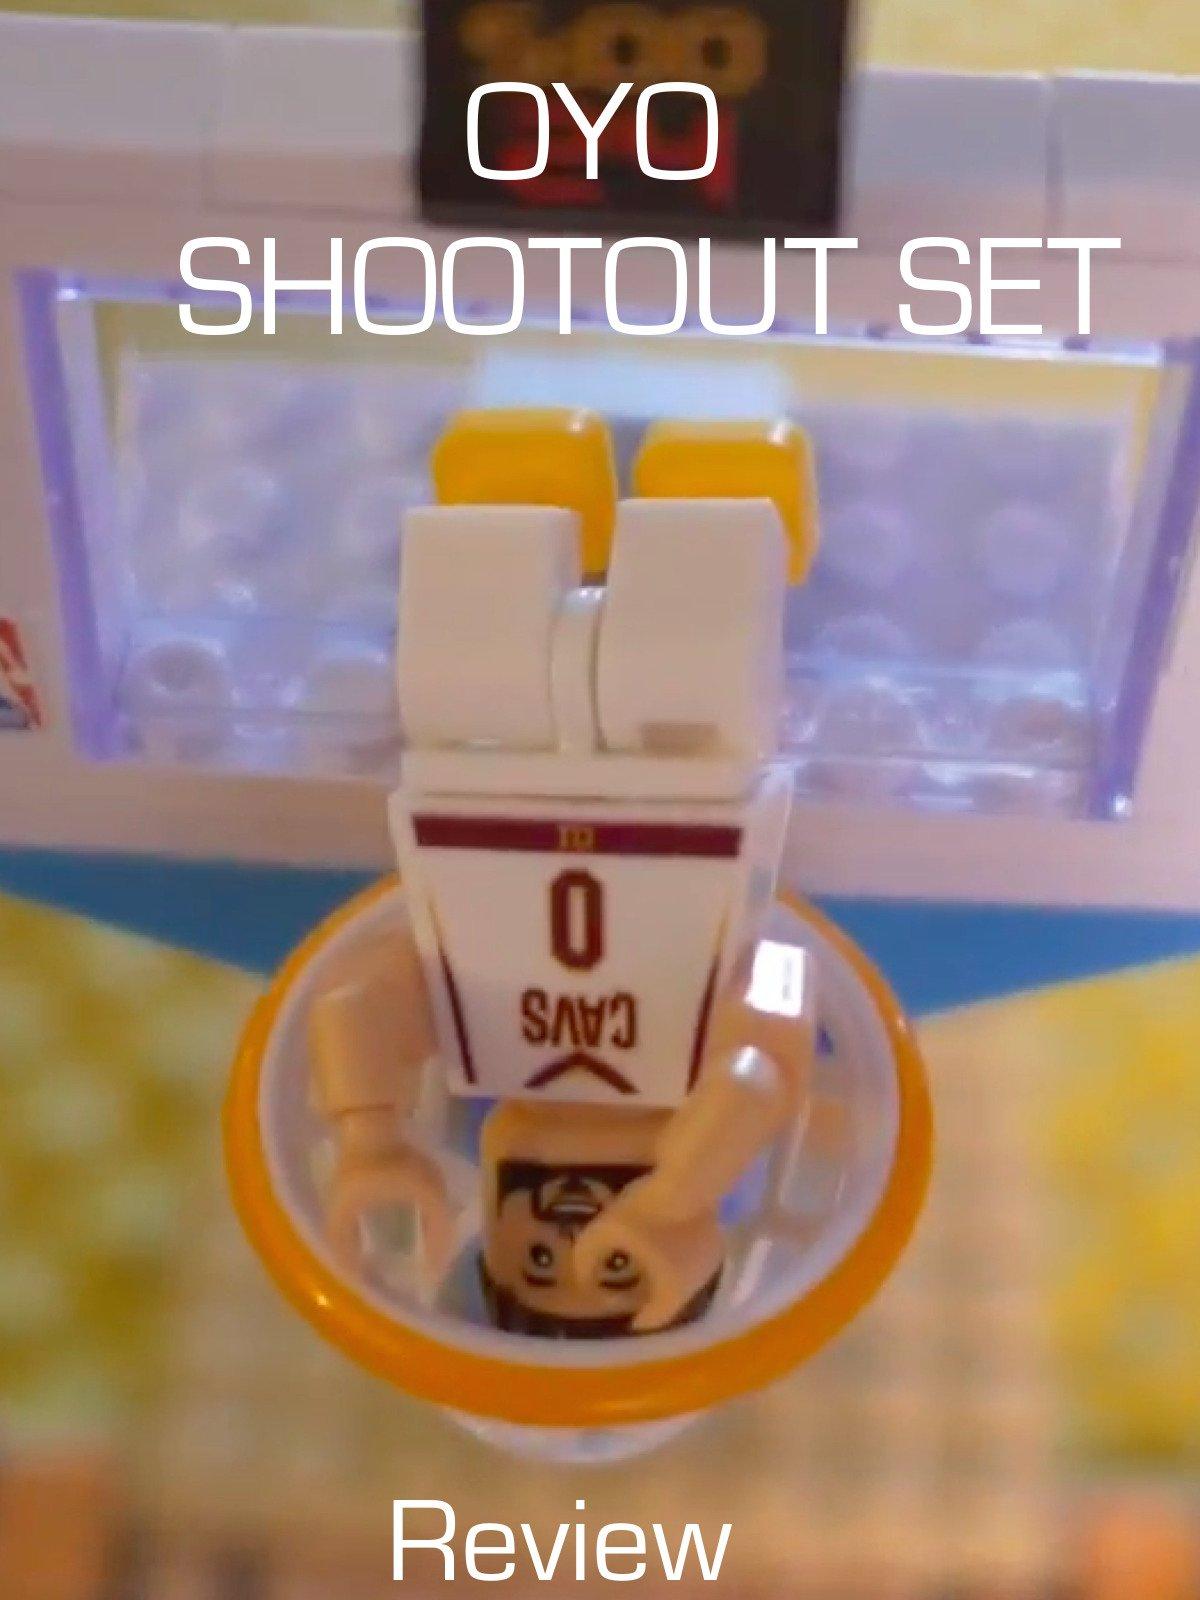 Review: Oyo Shootout Set Review